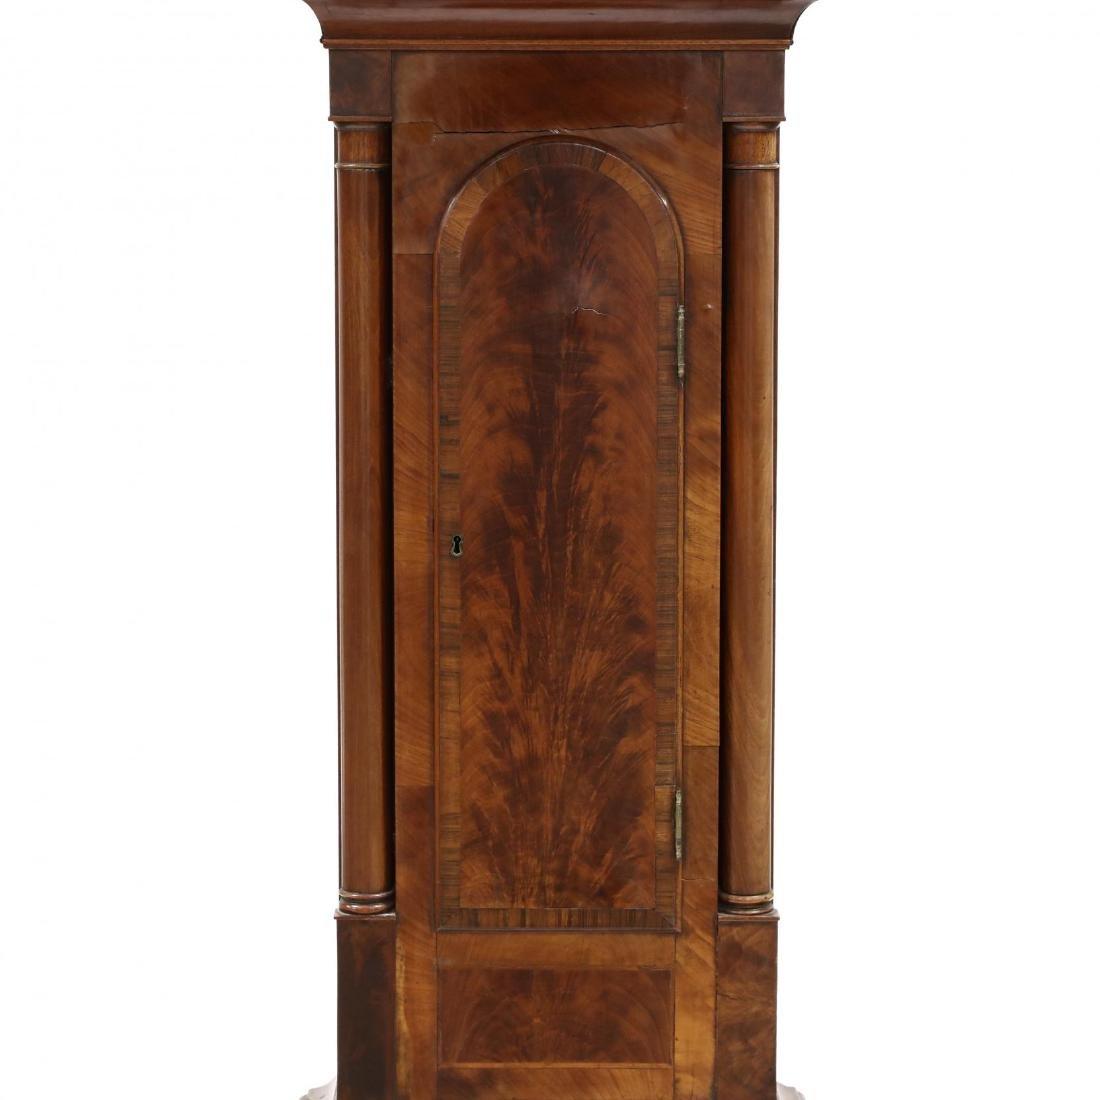 Scottish Mahogany Tall Case Clock, Hay Mercer, Aberdeen - 3